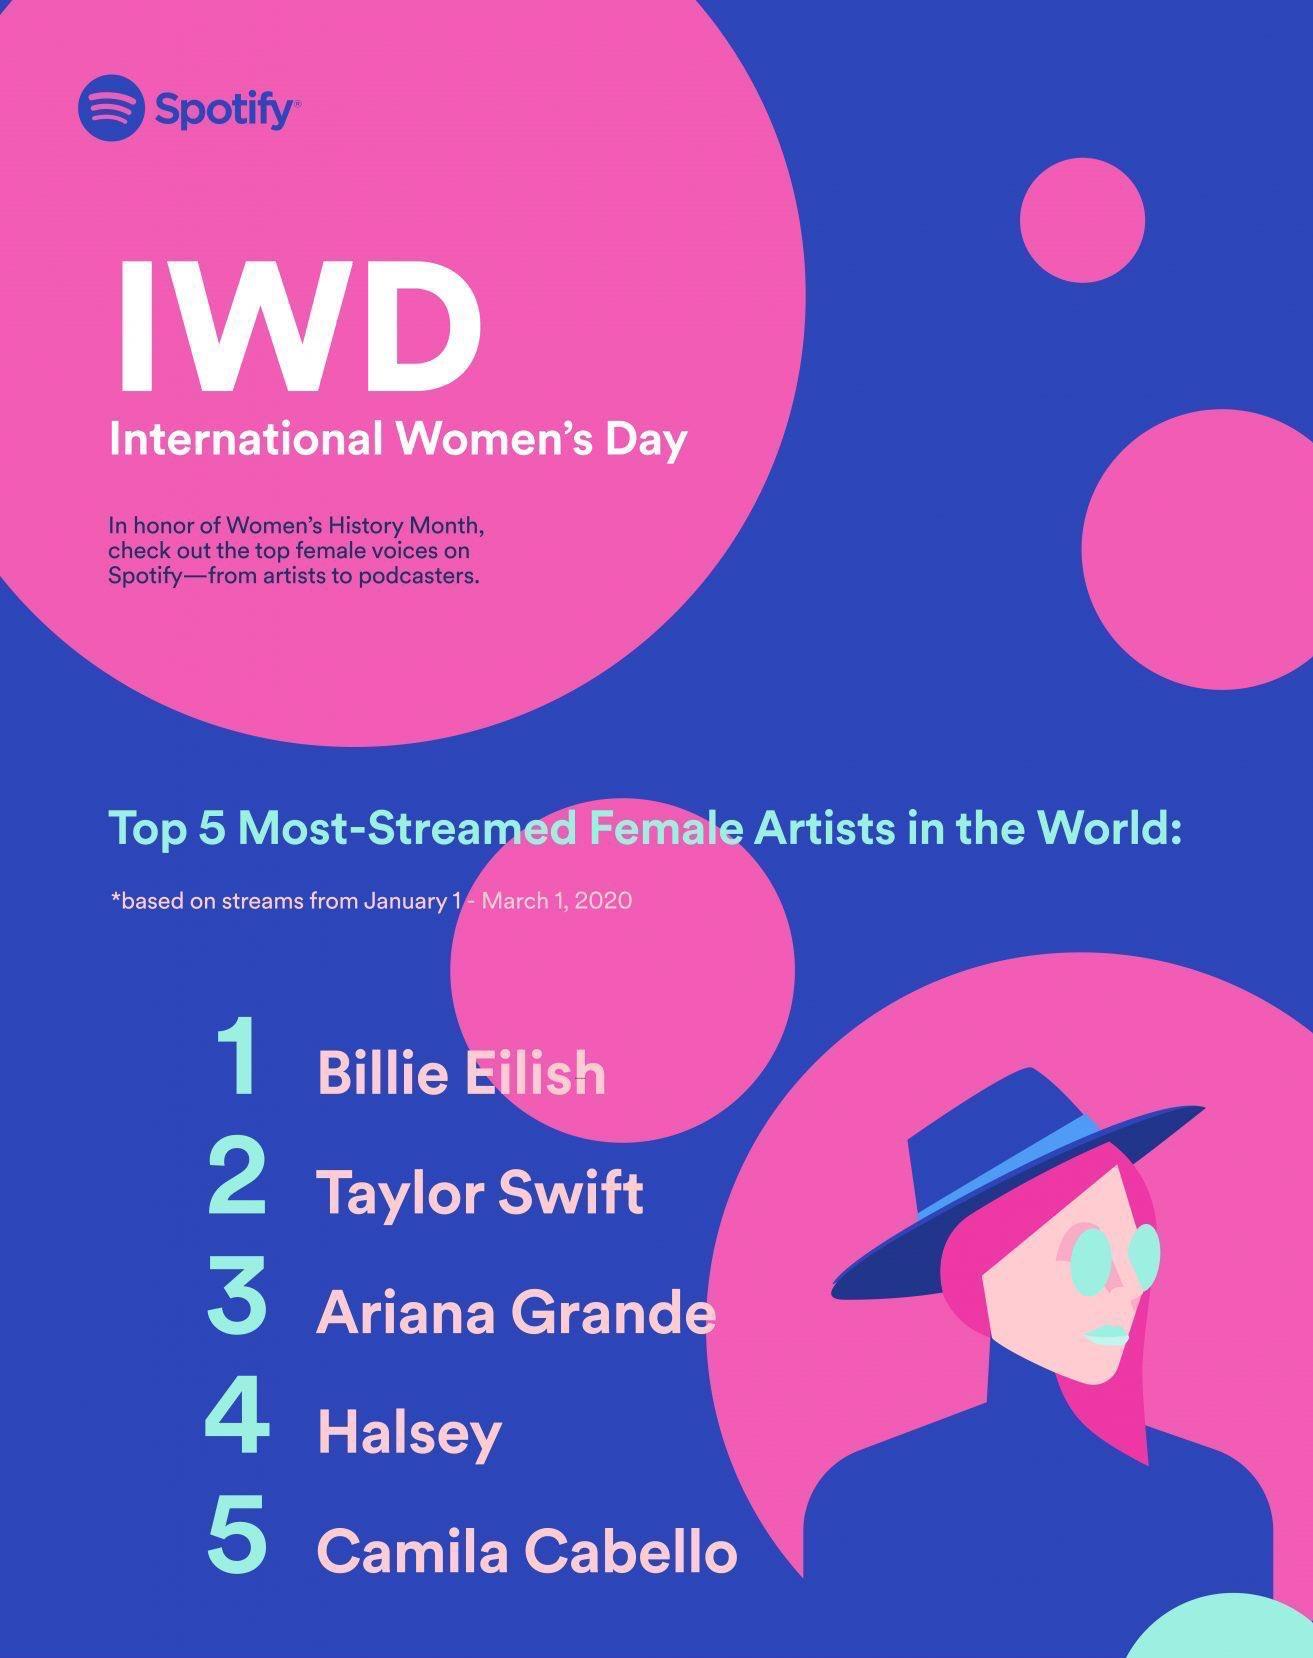 Pop Crave On Twitter Spotify Reveals Its Top 5 Most Streamed Female Artists Of 2020 So Far For Internationalwomensday 1 Billie Eilish 1 3 Billion 2 Taylor Swift 750 Million 3 Ariana Grande 700